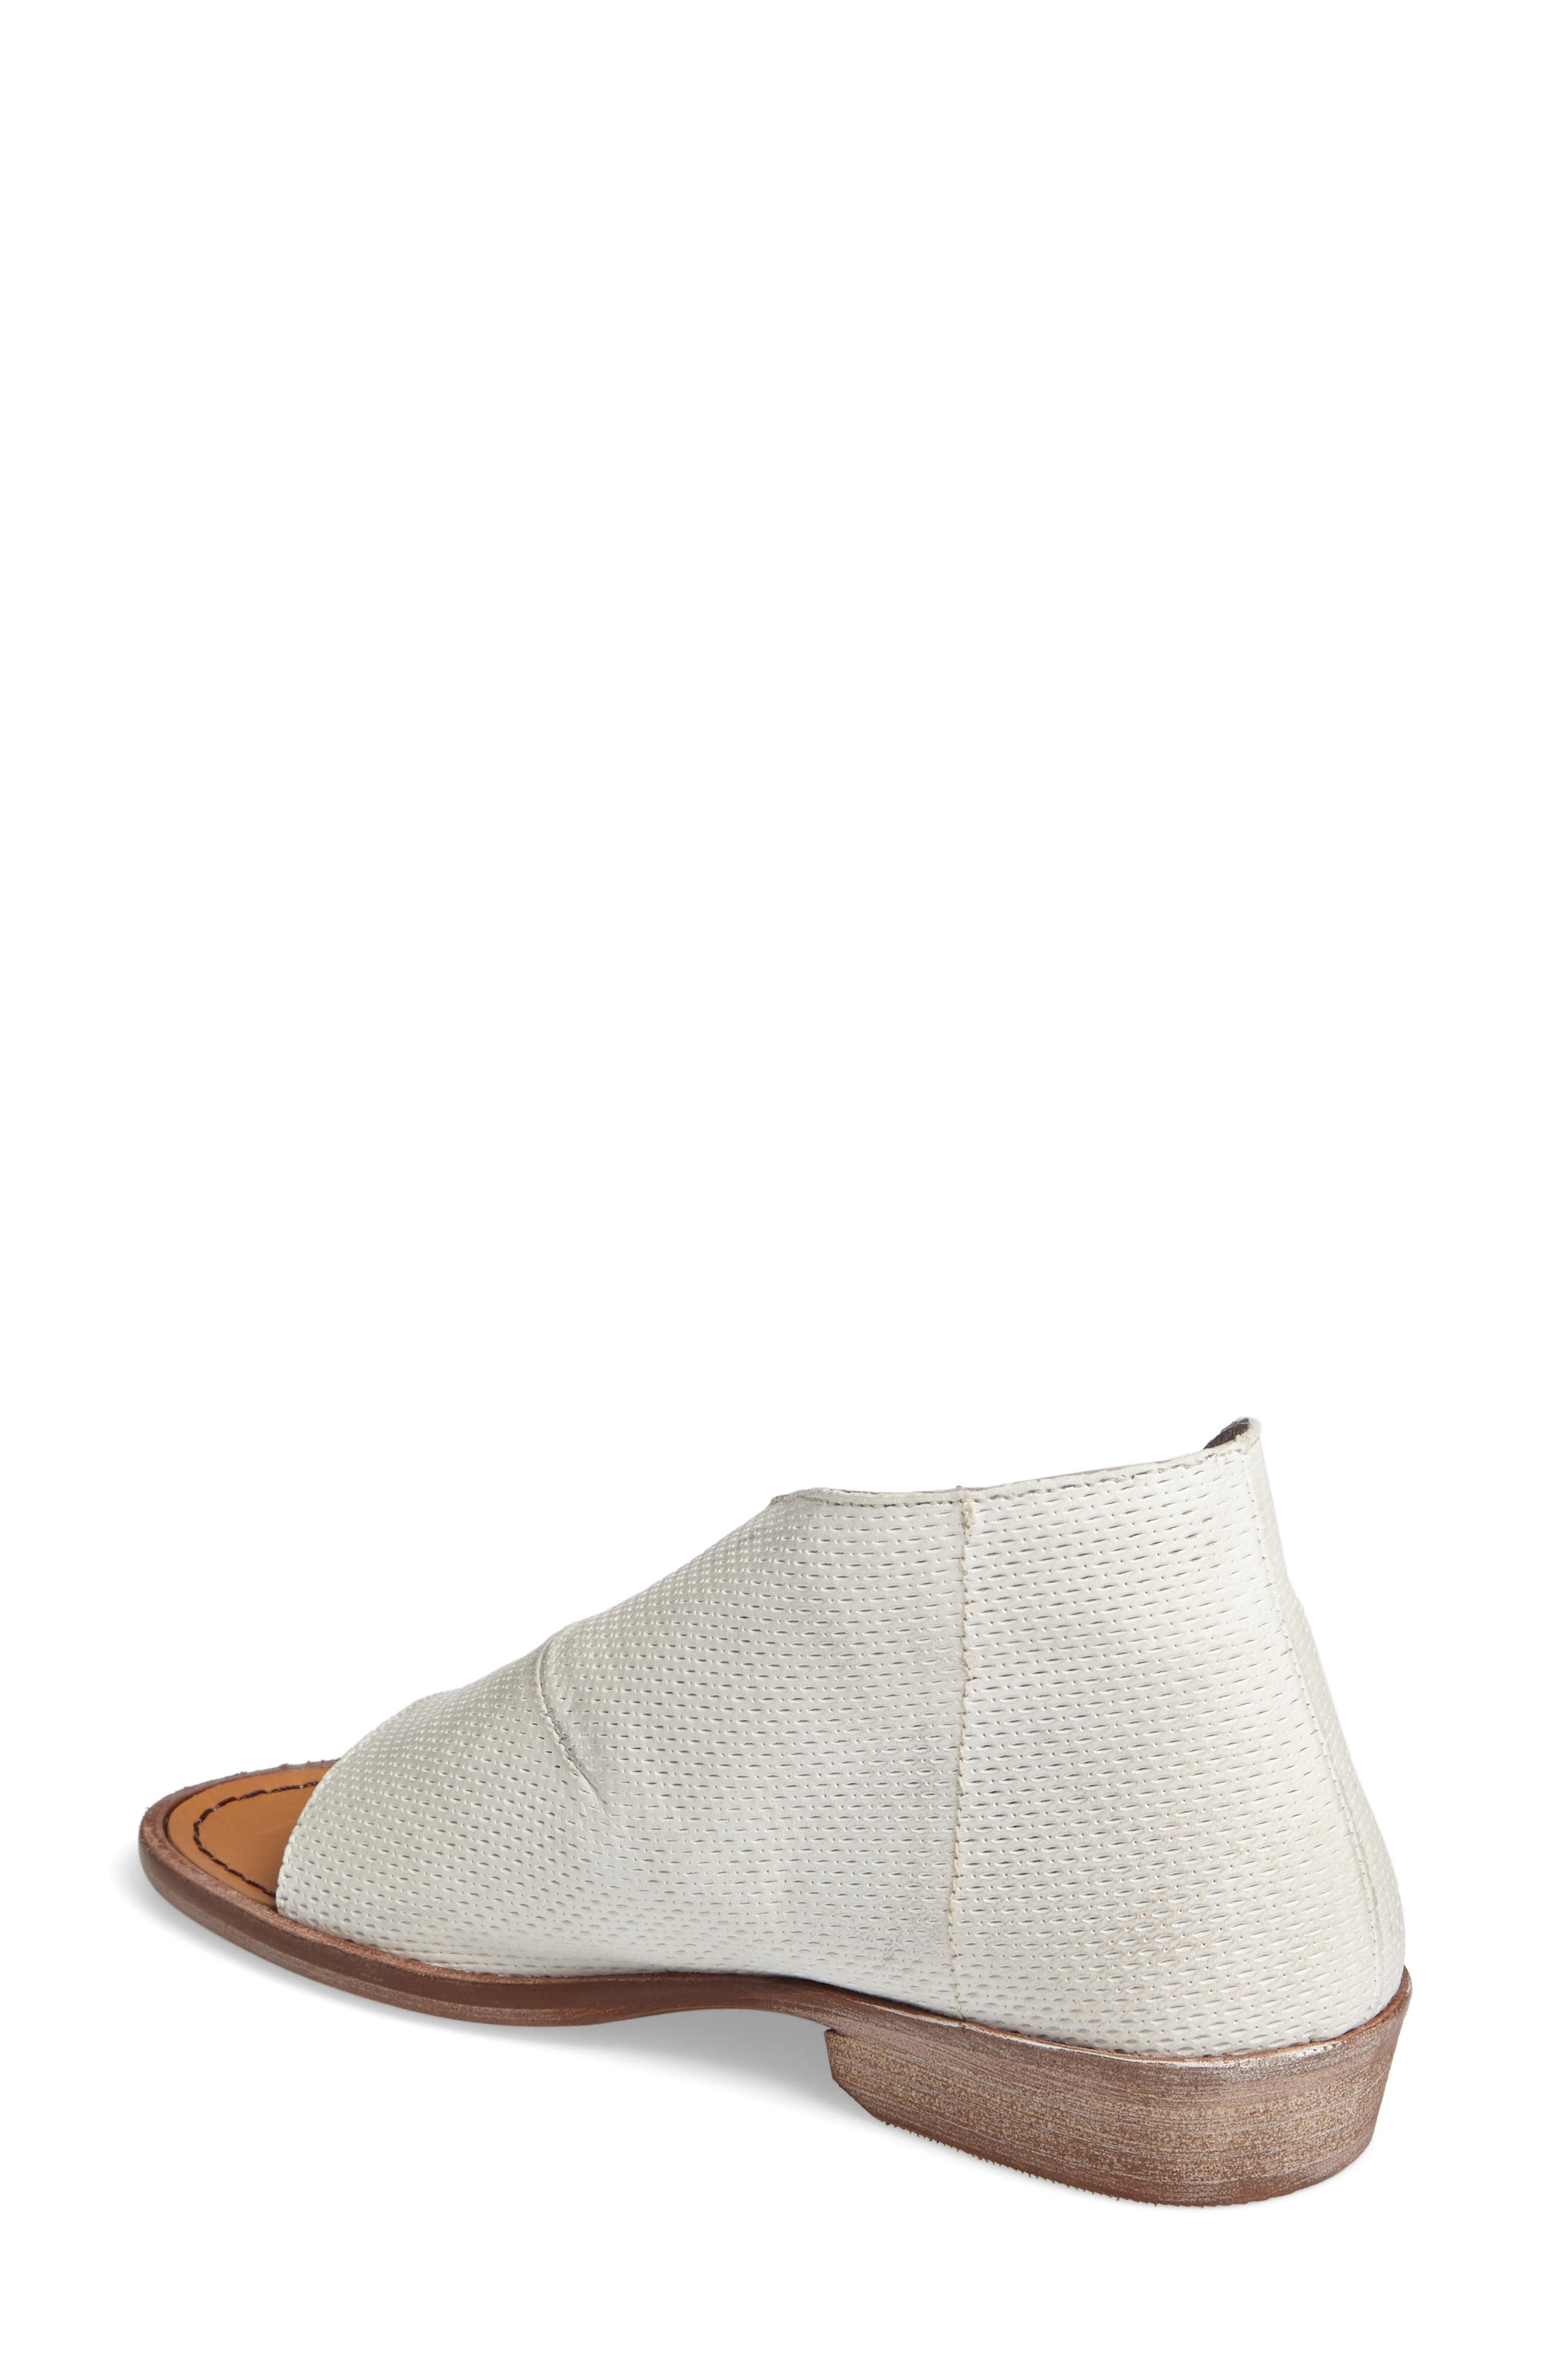 'Mont Blanc' Asymmetrical Sandal,                             Alternate thumbnail 23, color,